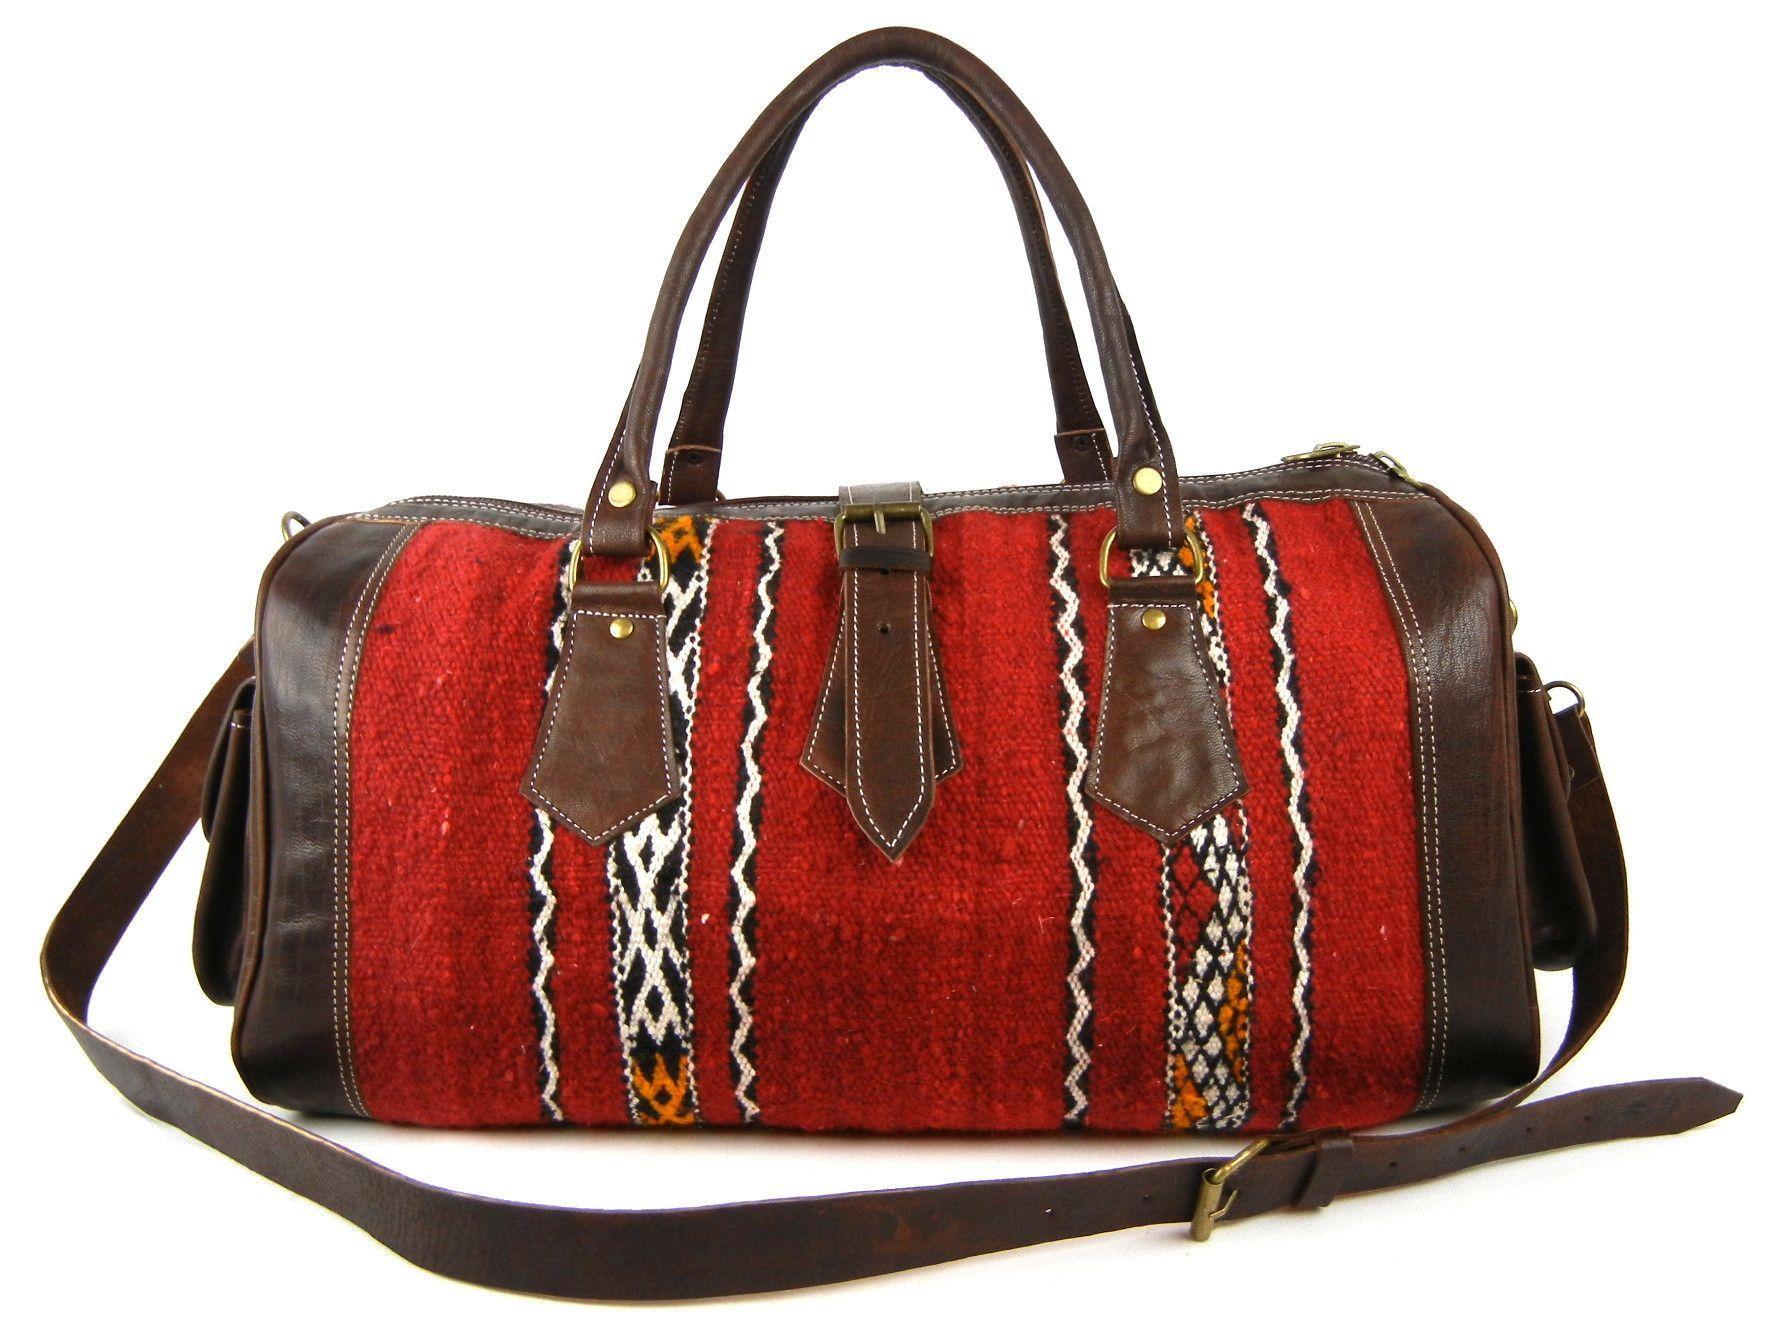 Yara - Berber Kilim and Leather Duffle Bag - Medium  37f4fa55c55a6